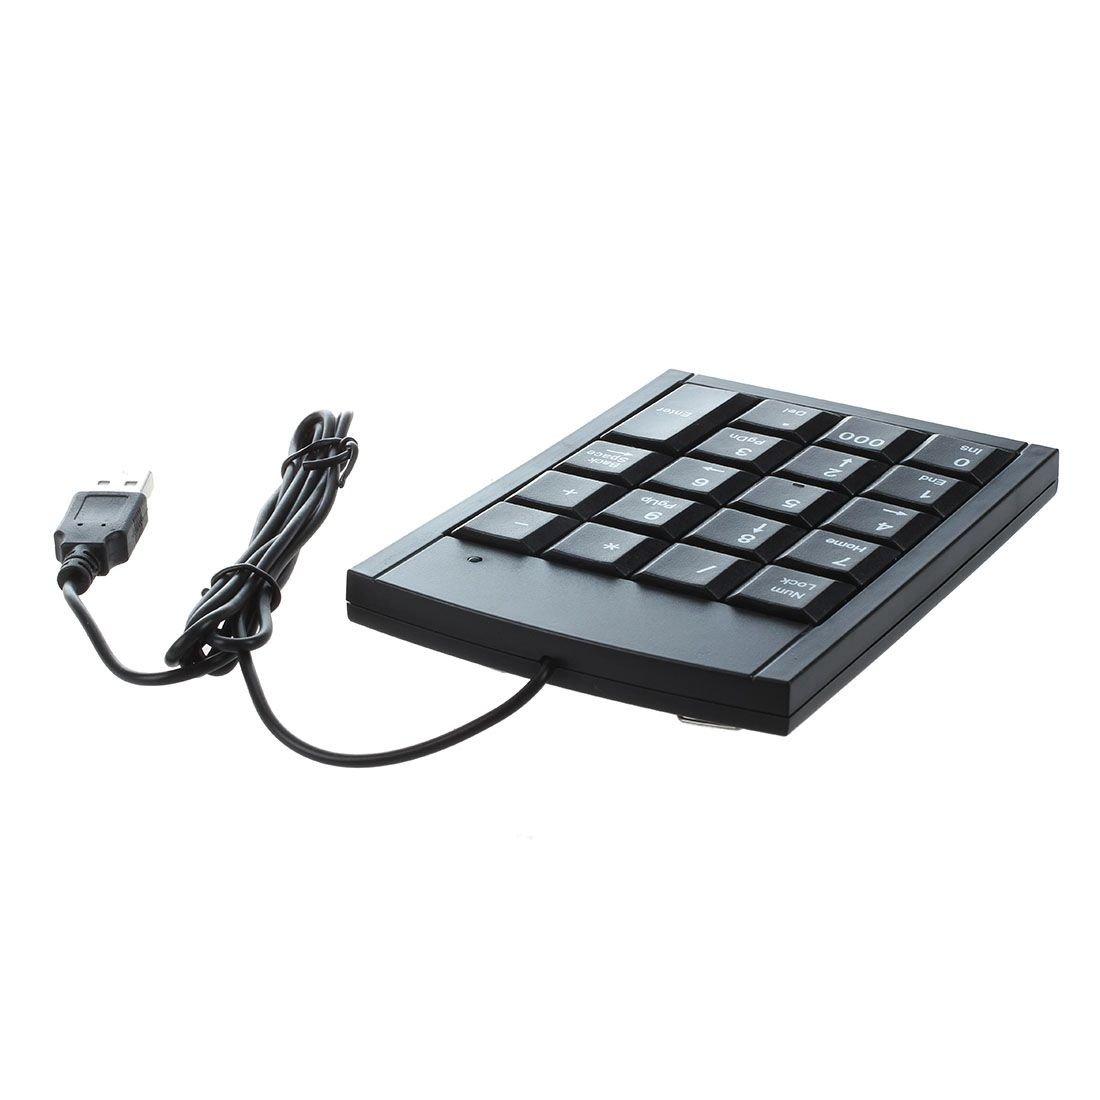 Moligh doll Mini Teclado numerico USB Teclado numerico para Ordenador portatil PC